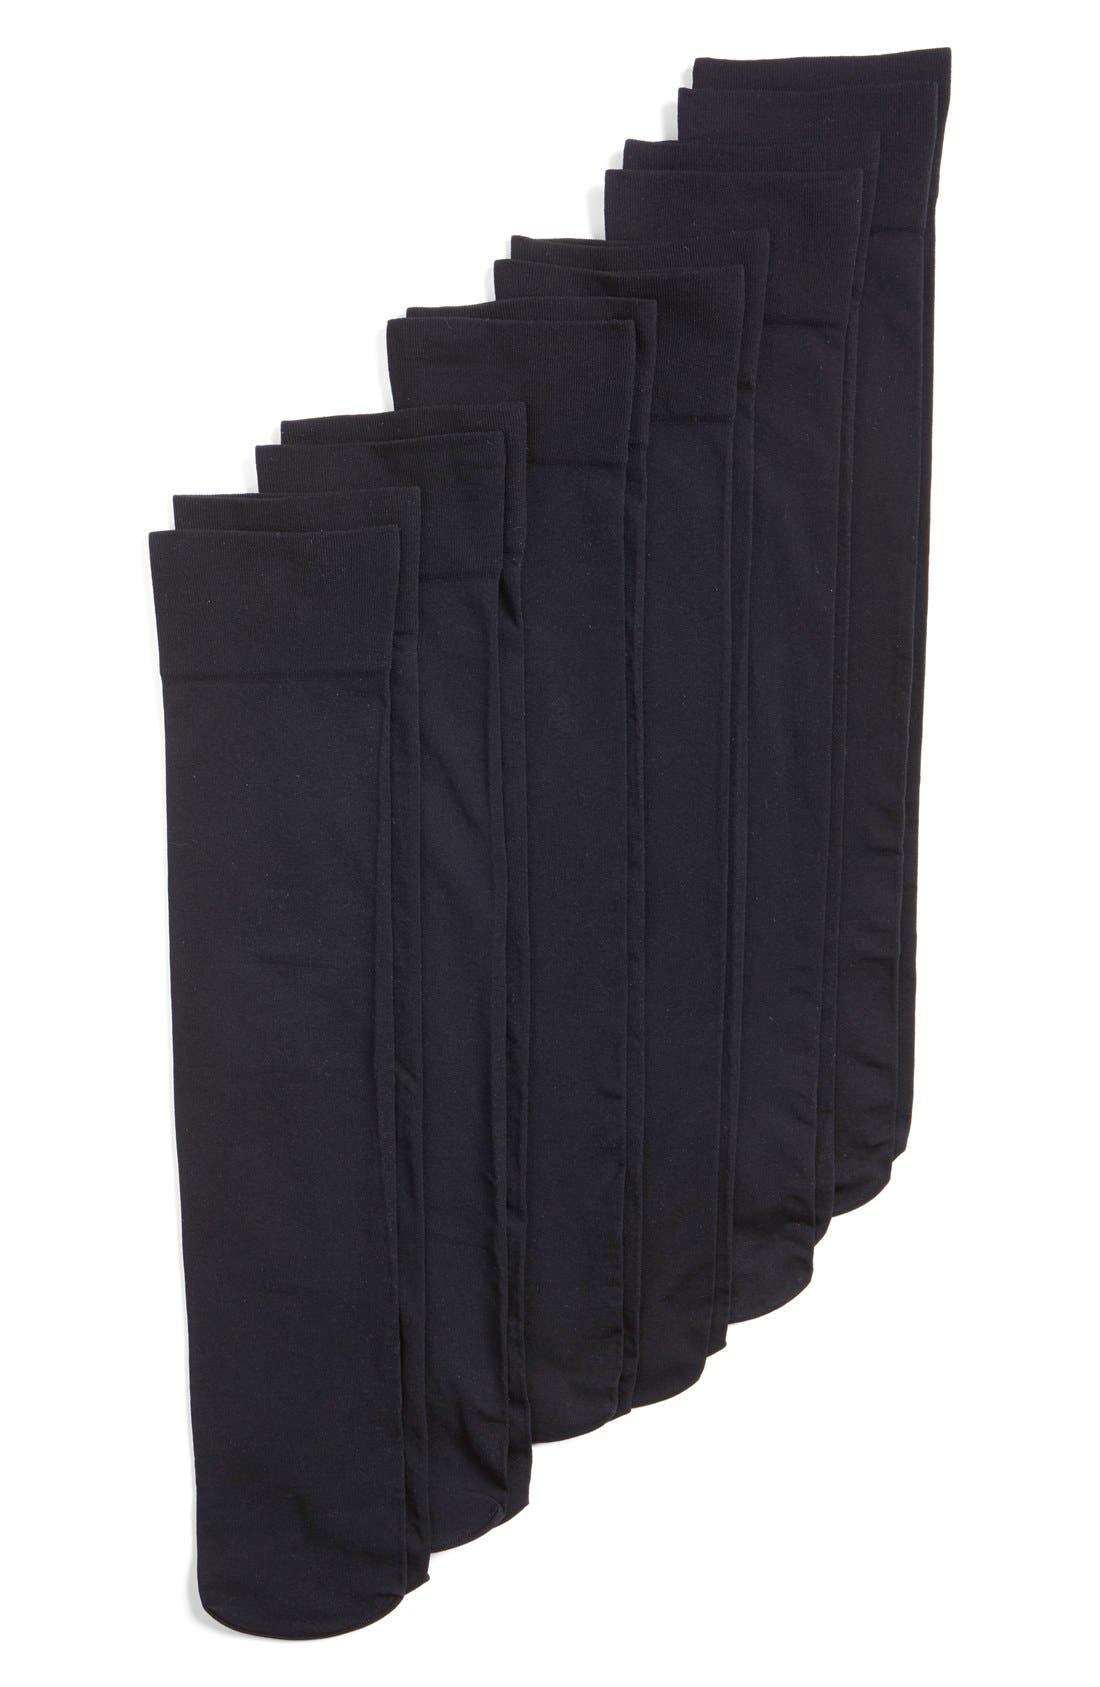 6-Pack Opaque Trouser Socks,                         Main,                         color, BLACK